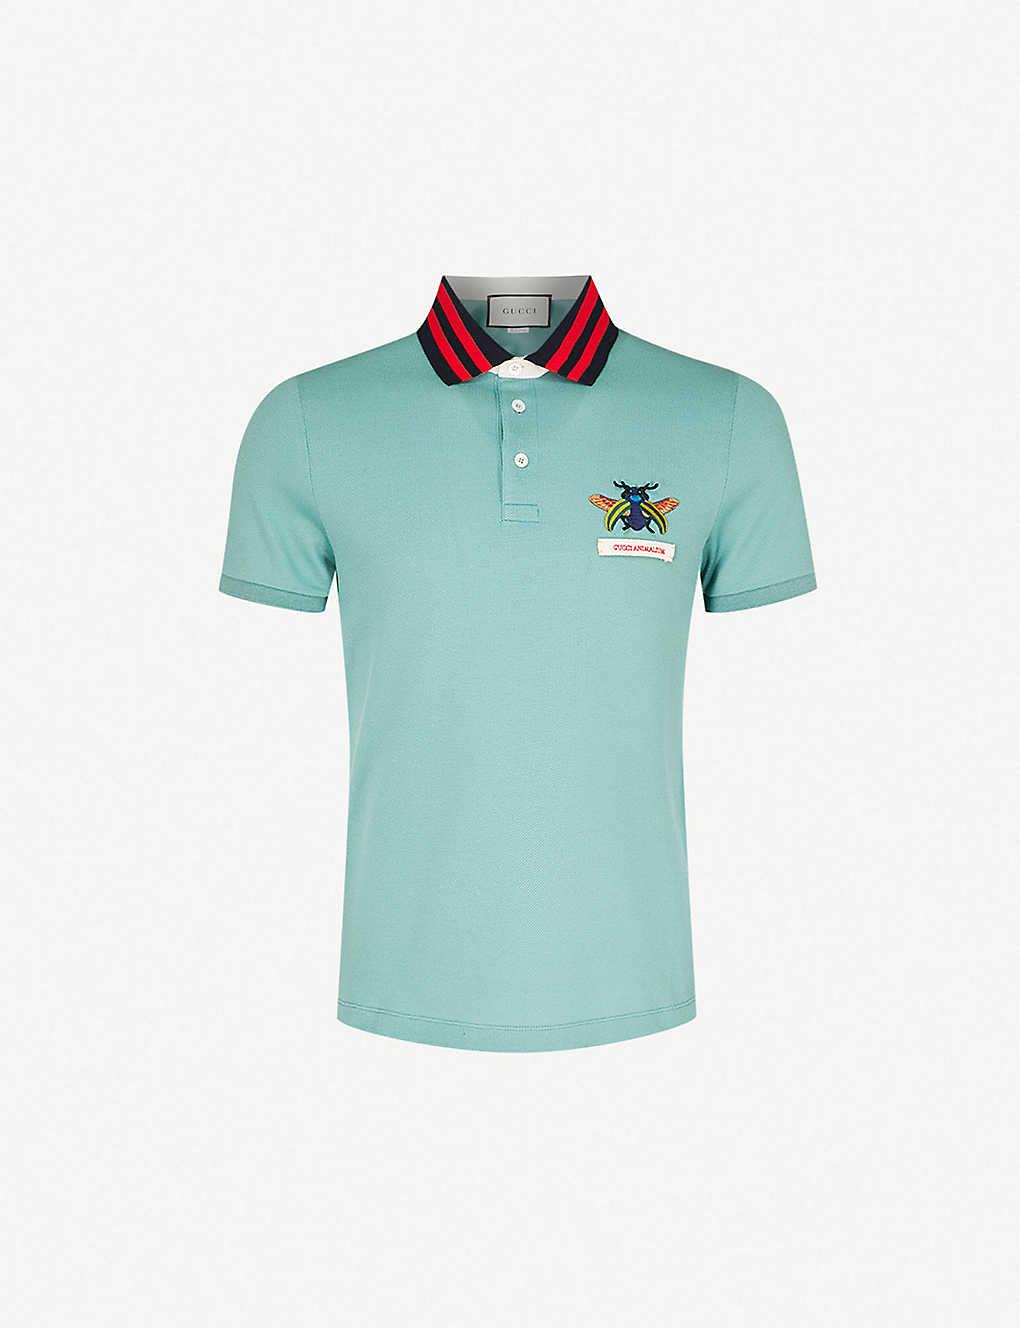 841bc9702 GUCCI - Gucci Animalium stretch-cotton polo shirt   Selfridges.com